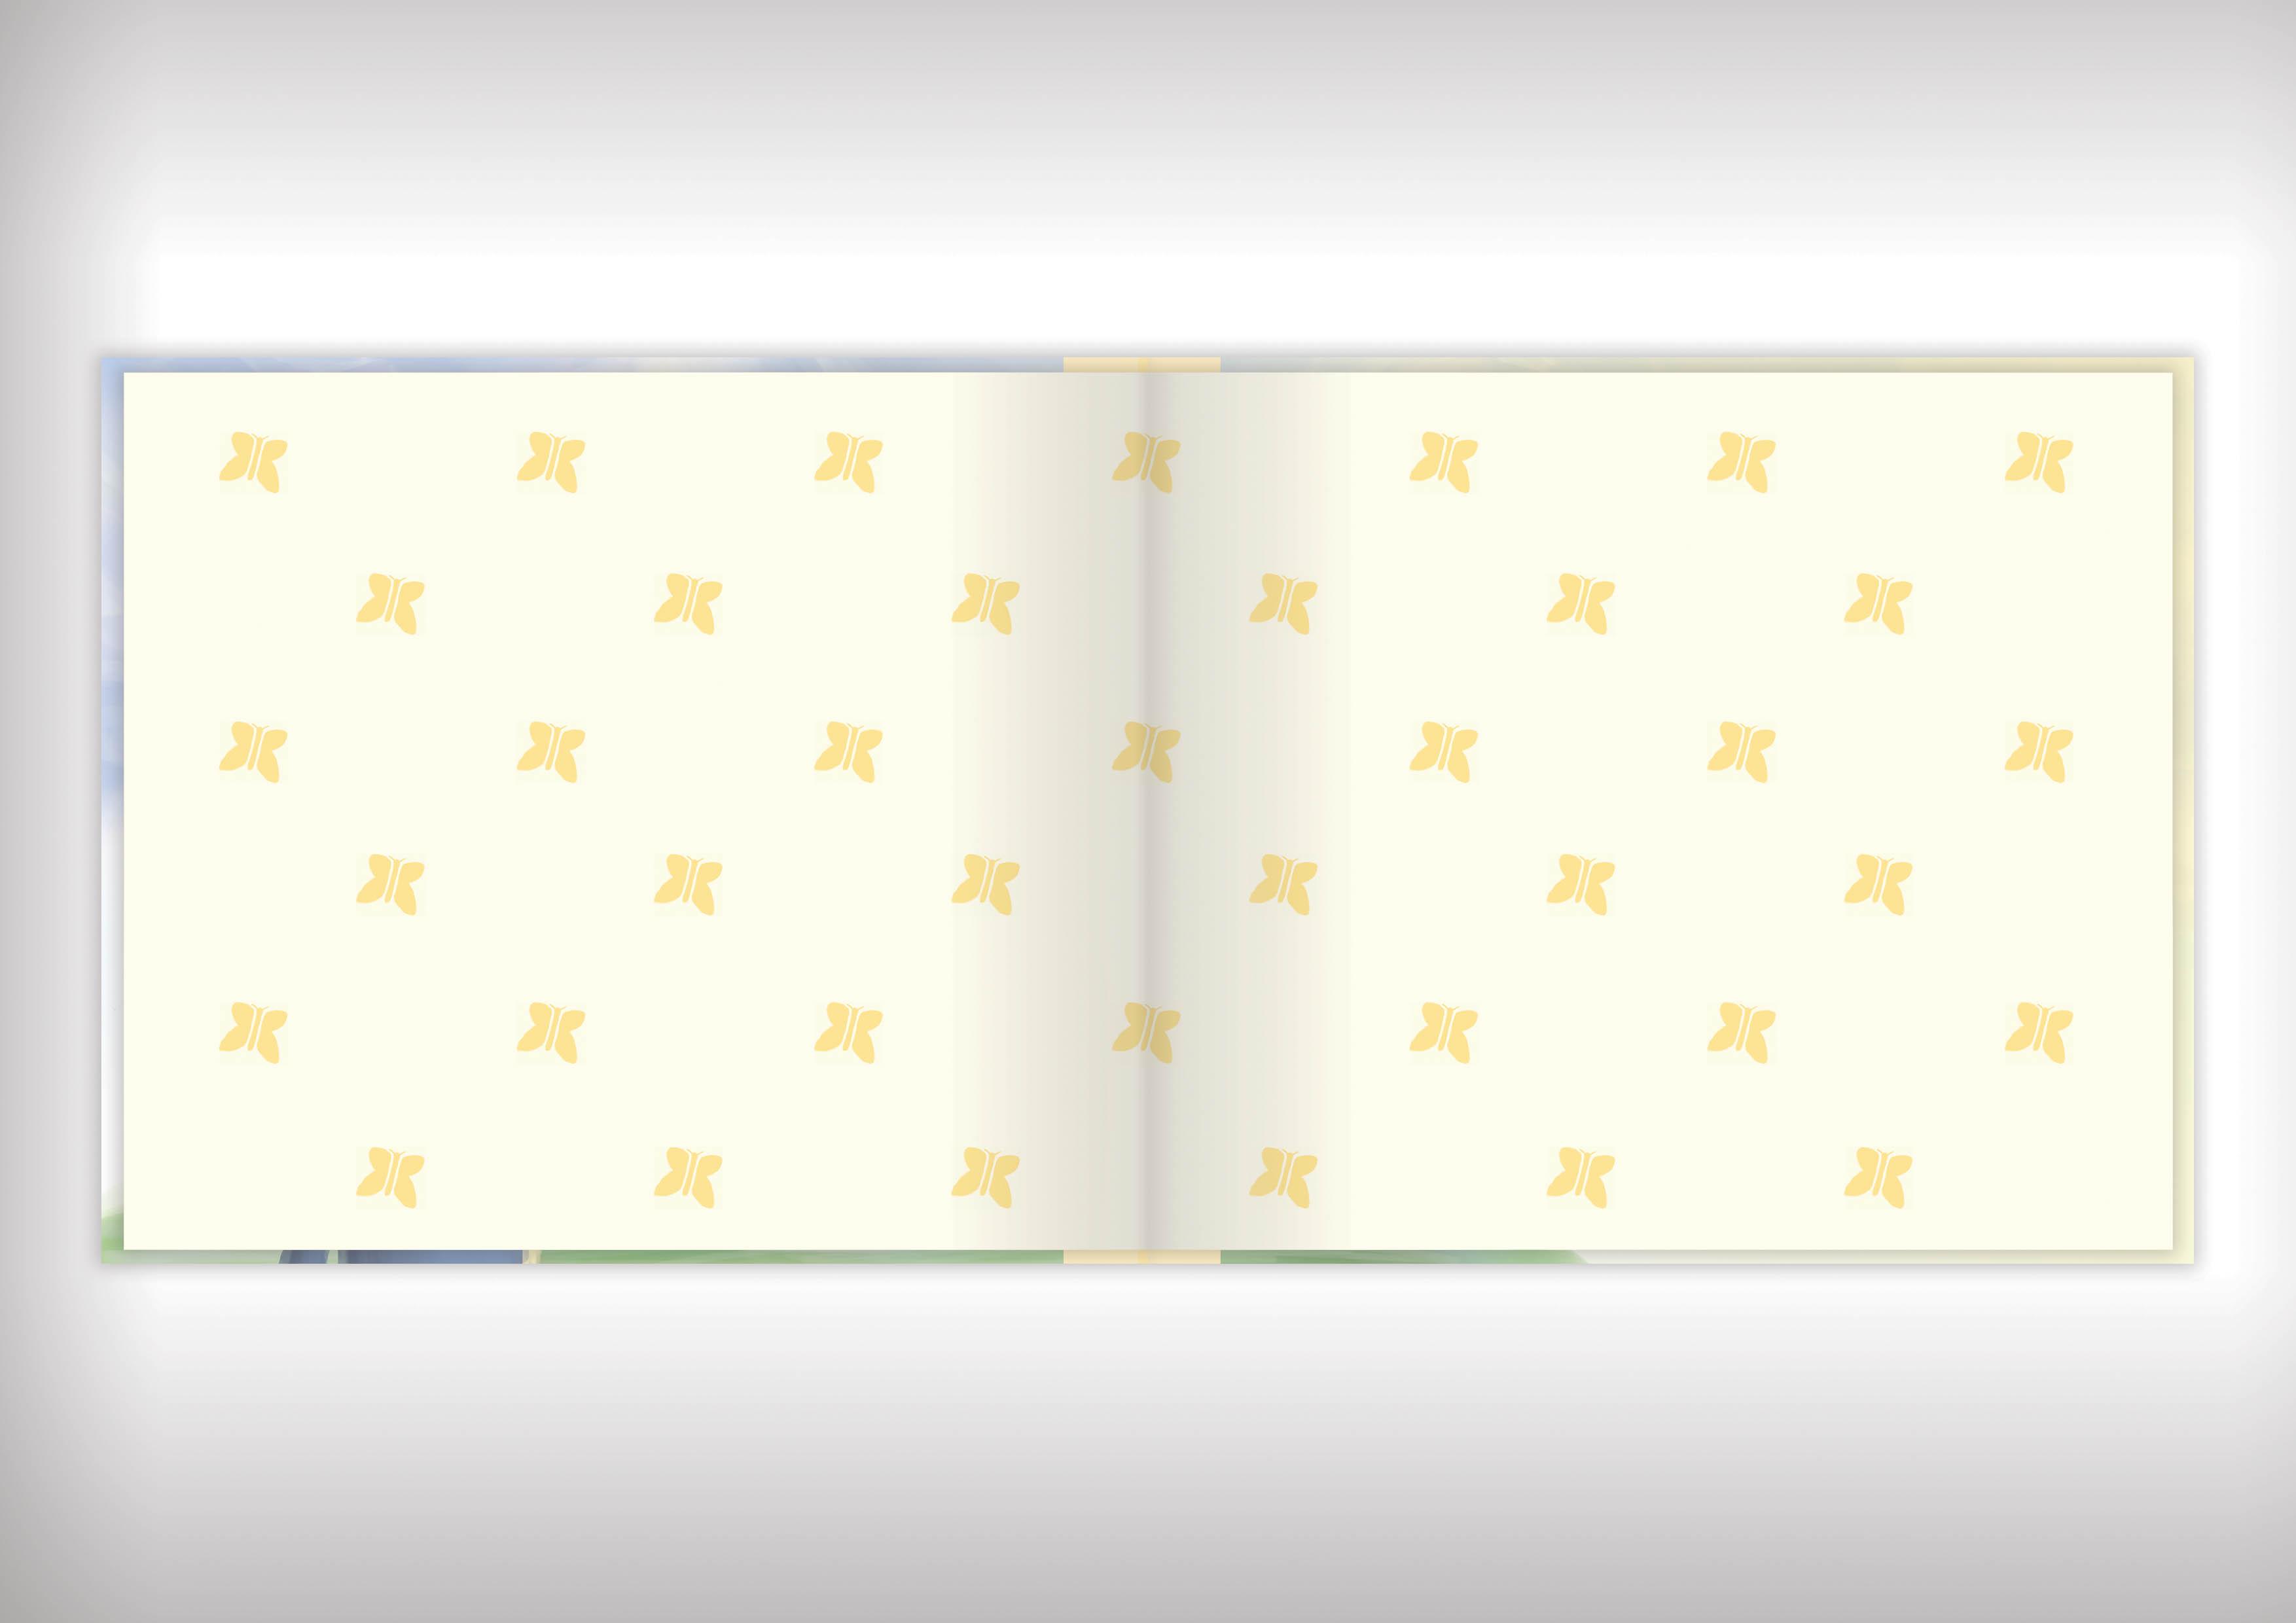 Kinderbuch_Mockup_01 MERGED_0000_Seite_35